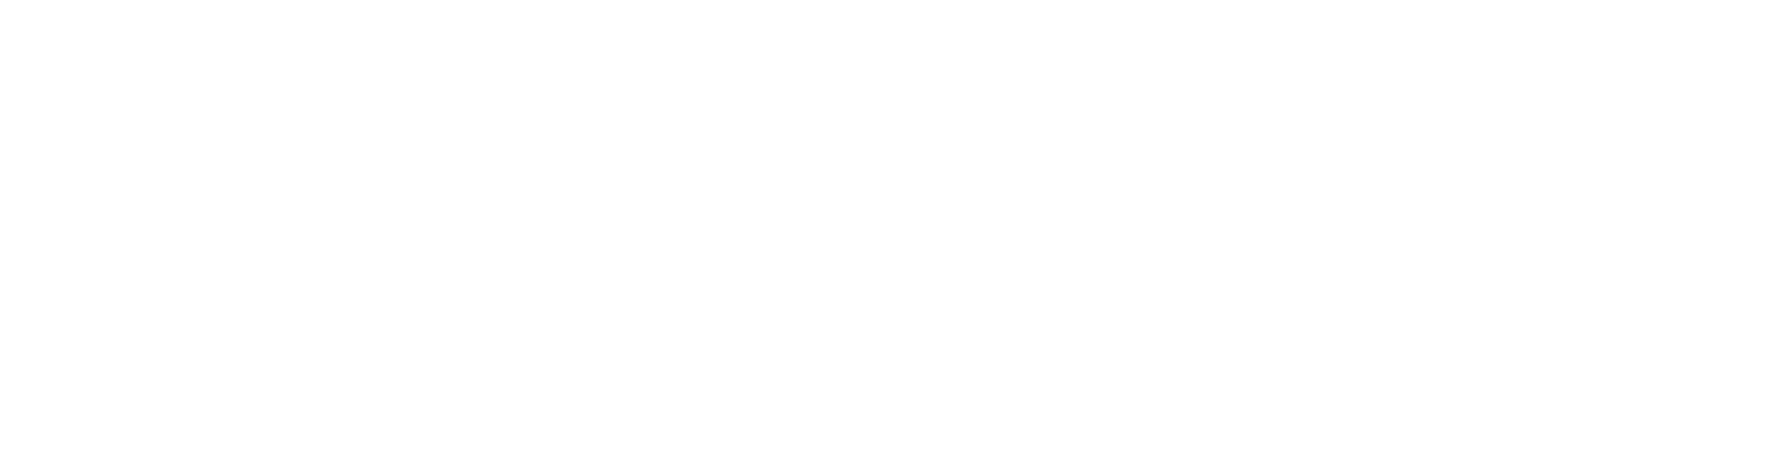 mapletree_white_logo.png